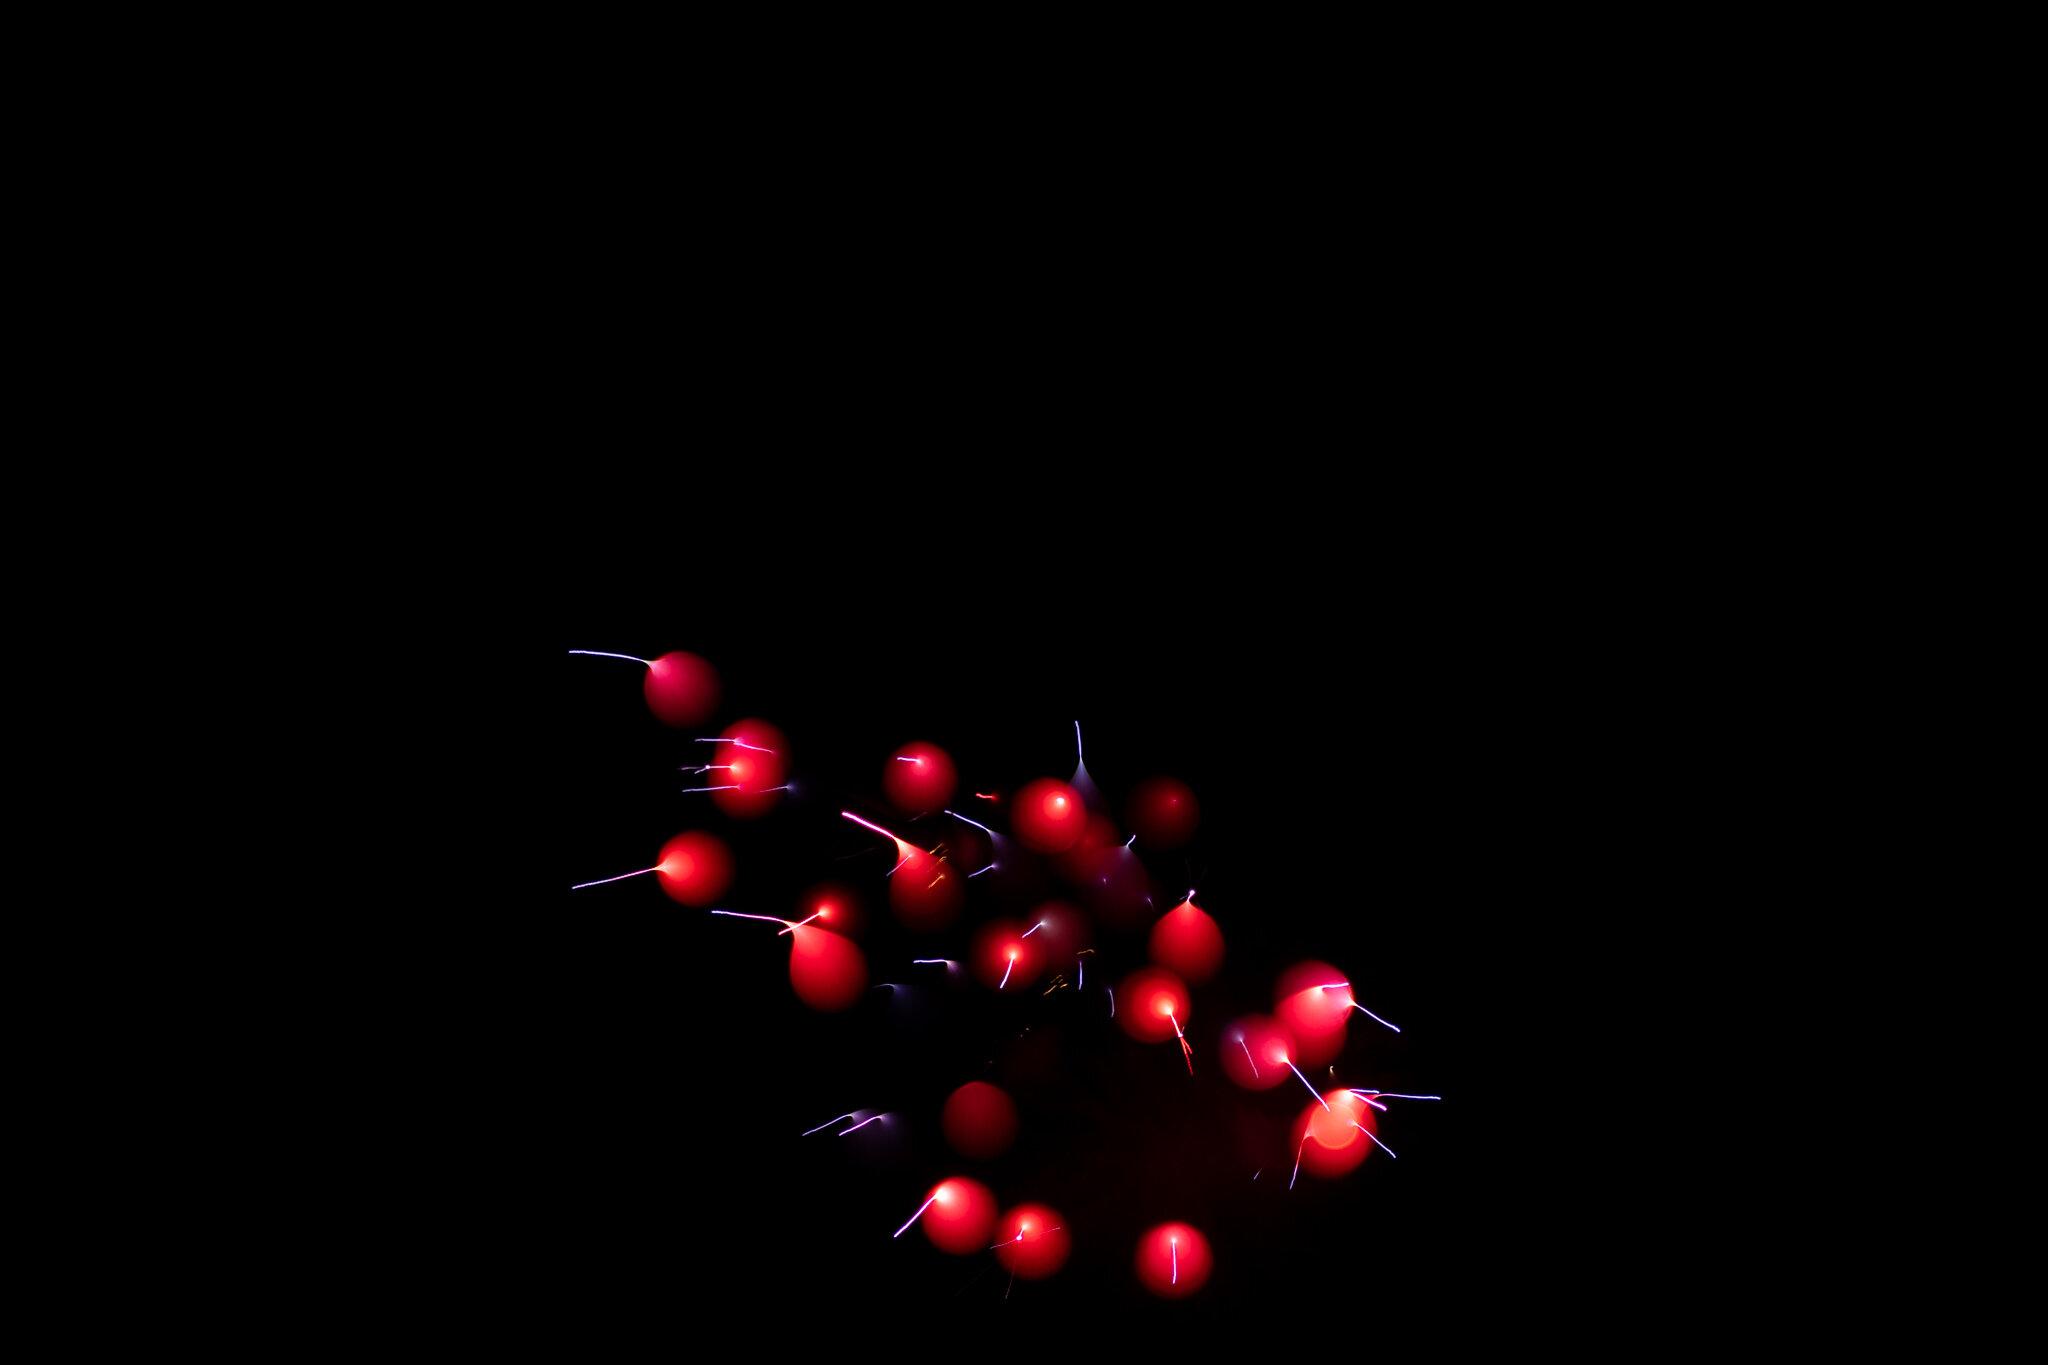 focuspulledfireworks-39.jpg